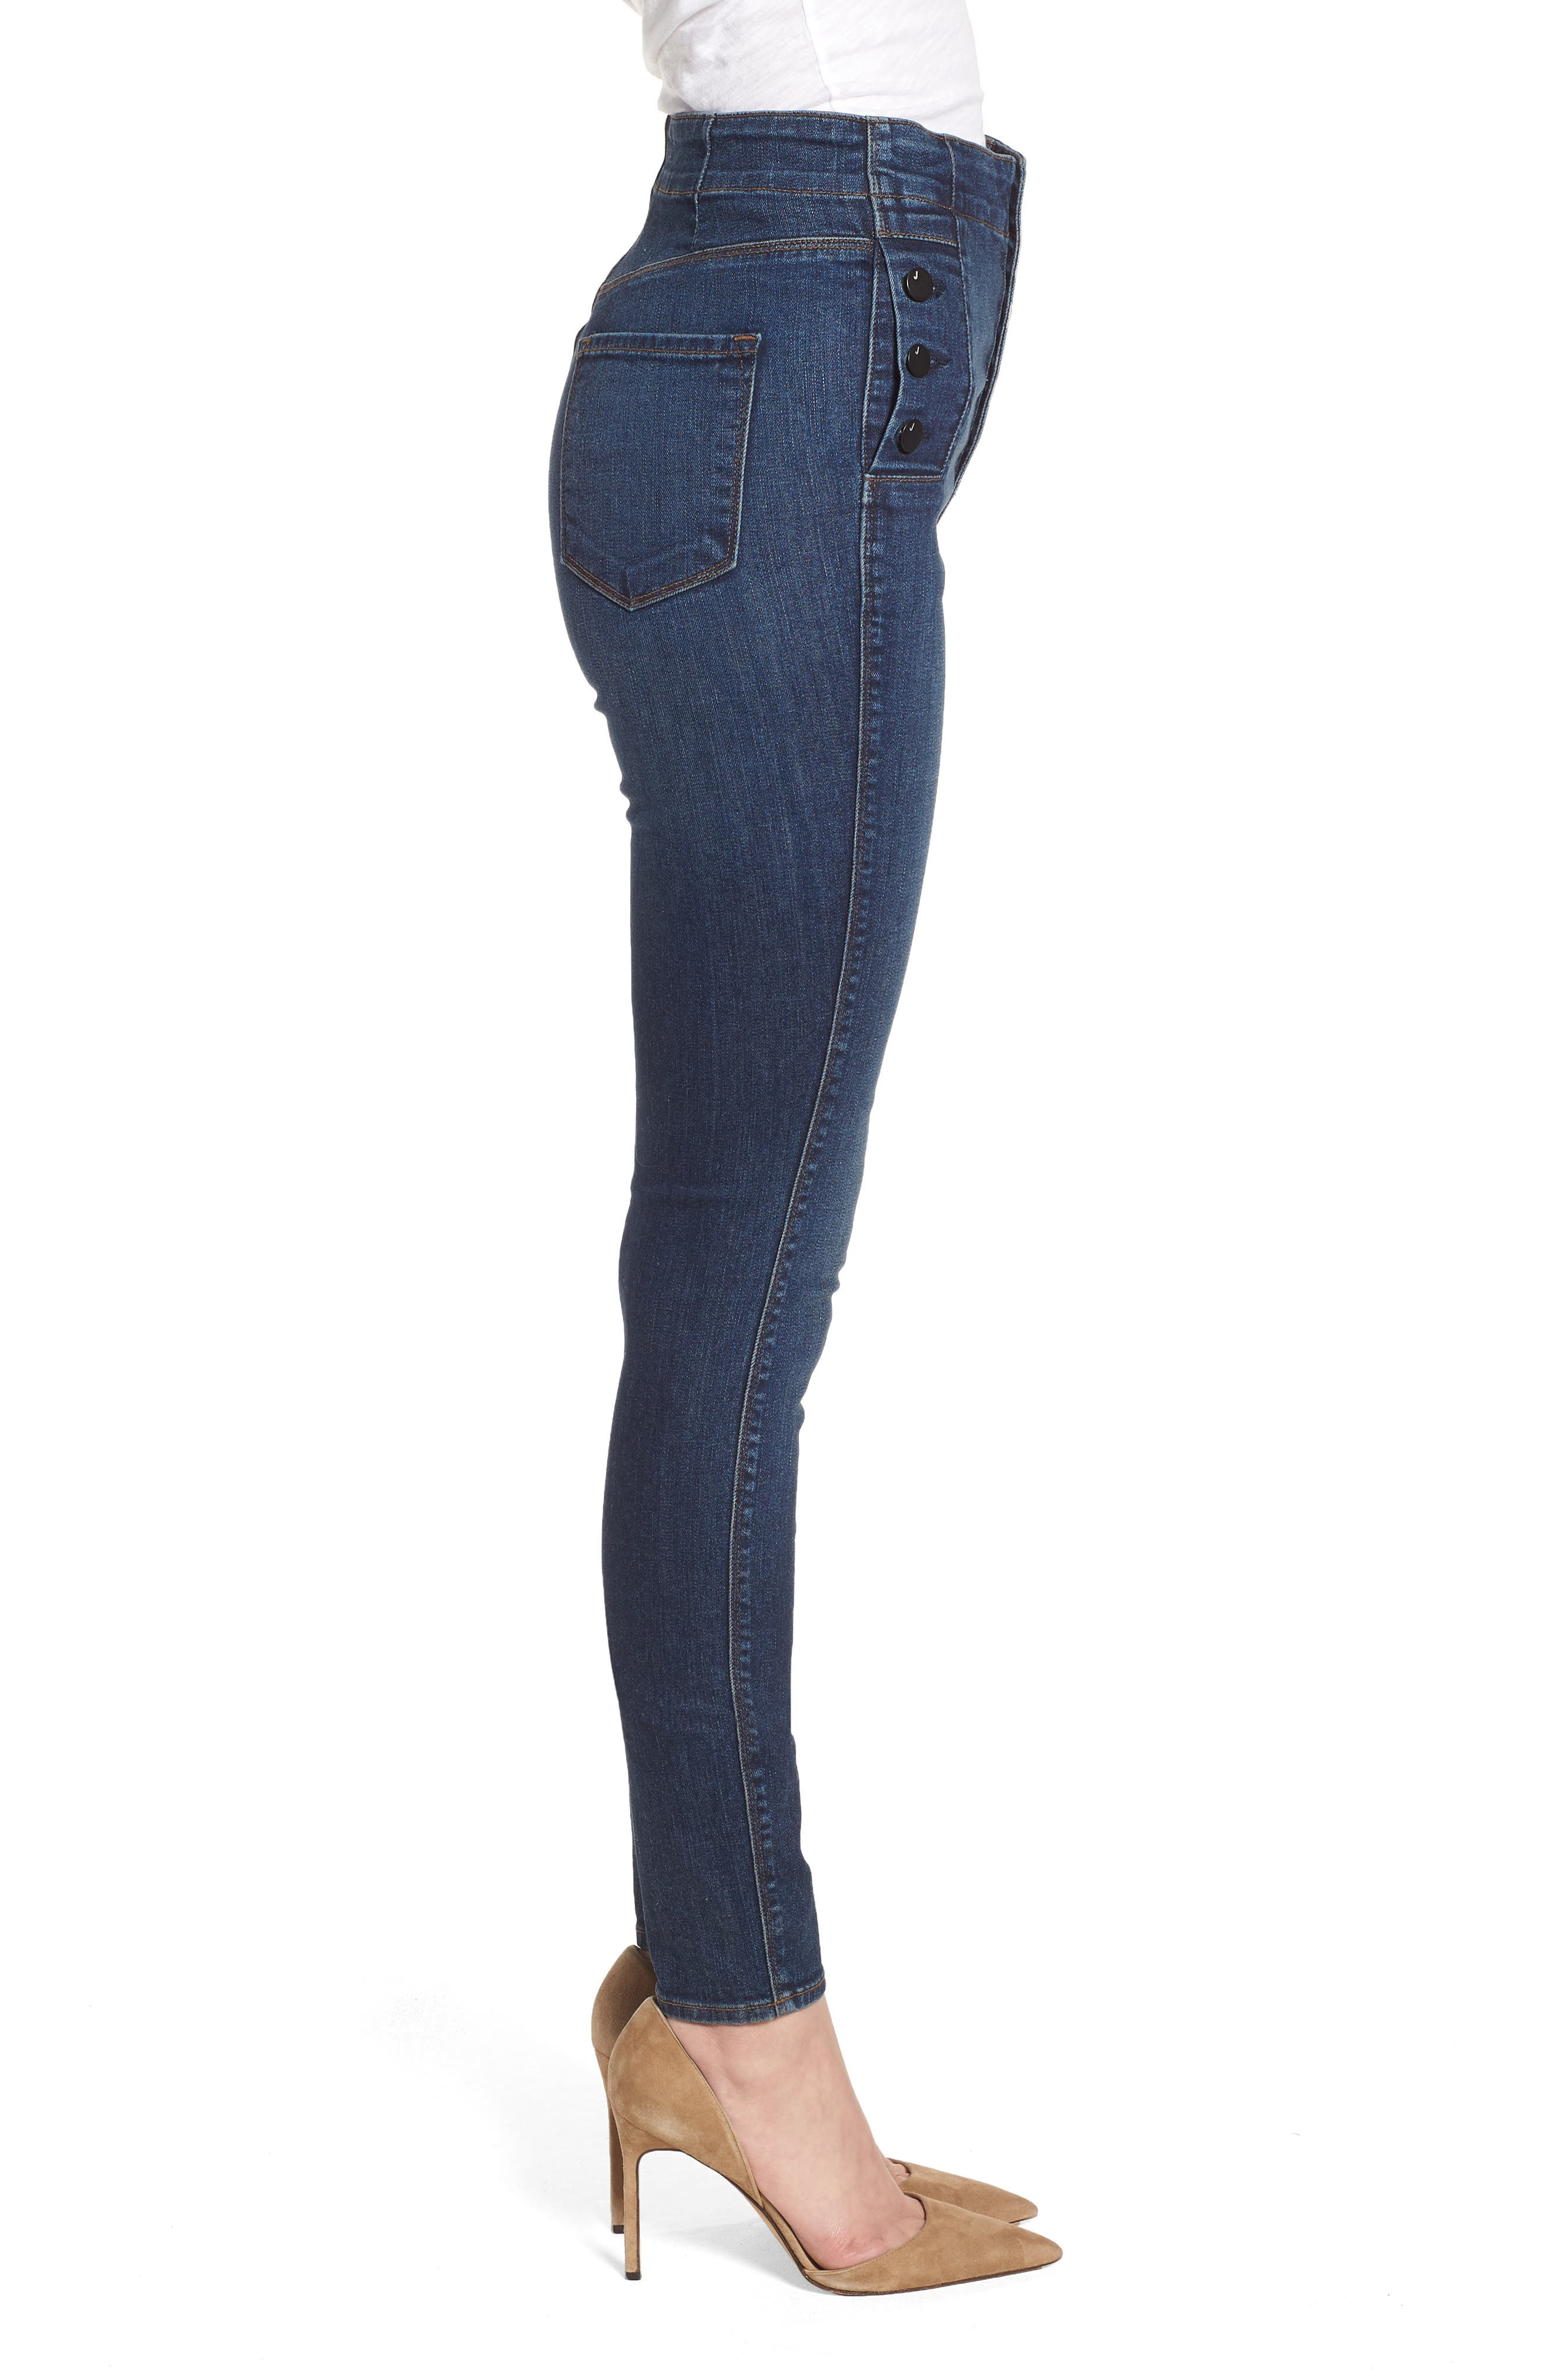 Natasha Sky High High Waist Skinny Jeans,                             Alternate thumbnail 3, color,                             Revival